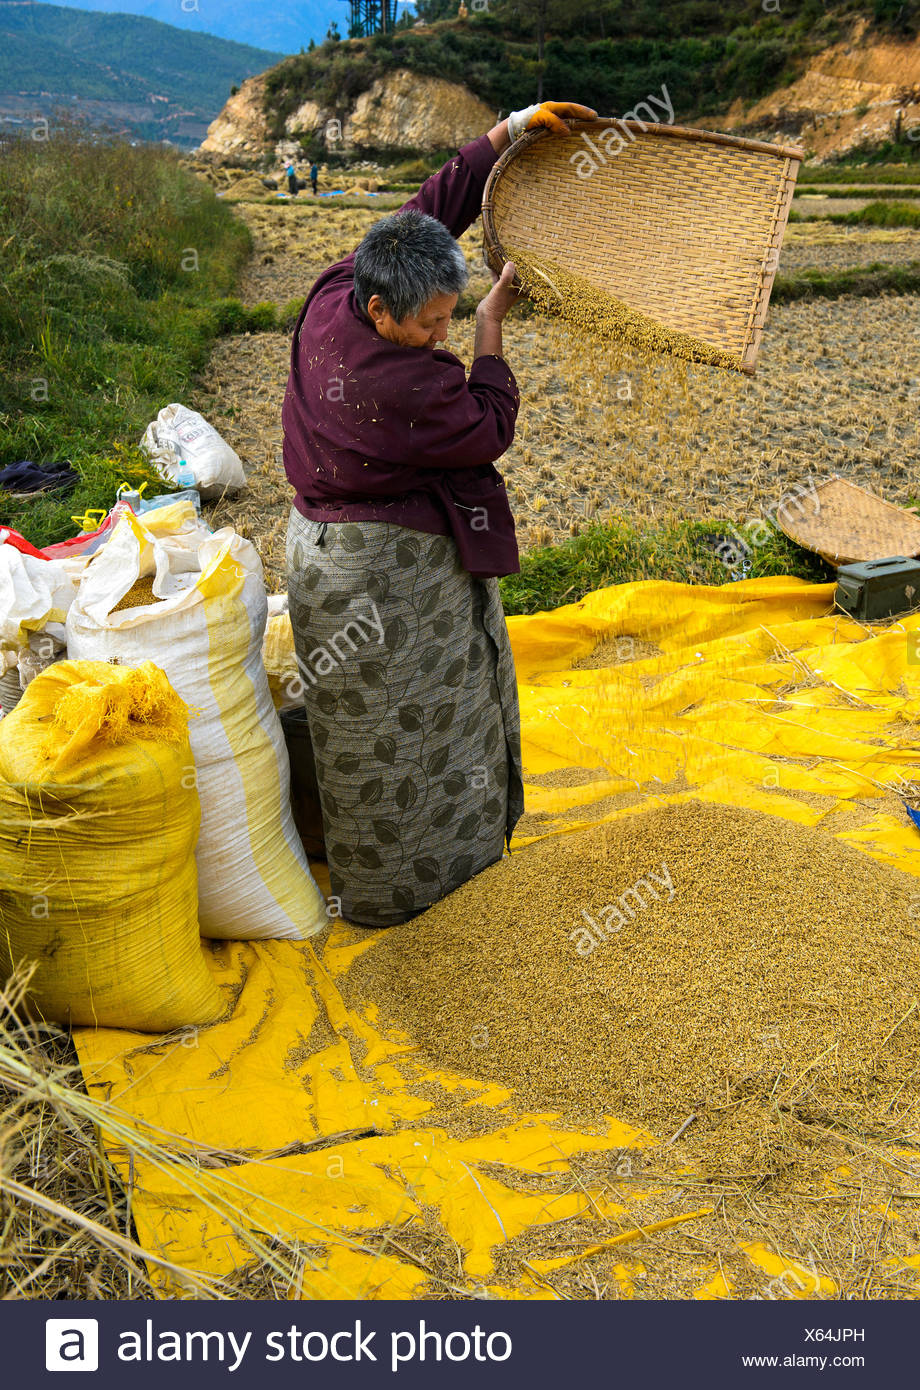 Bhutanese woman separating chaff from rice, Paro, Bhutan - Stock Image